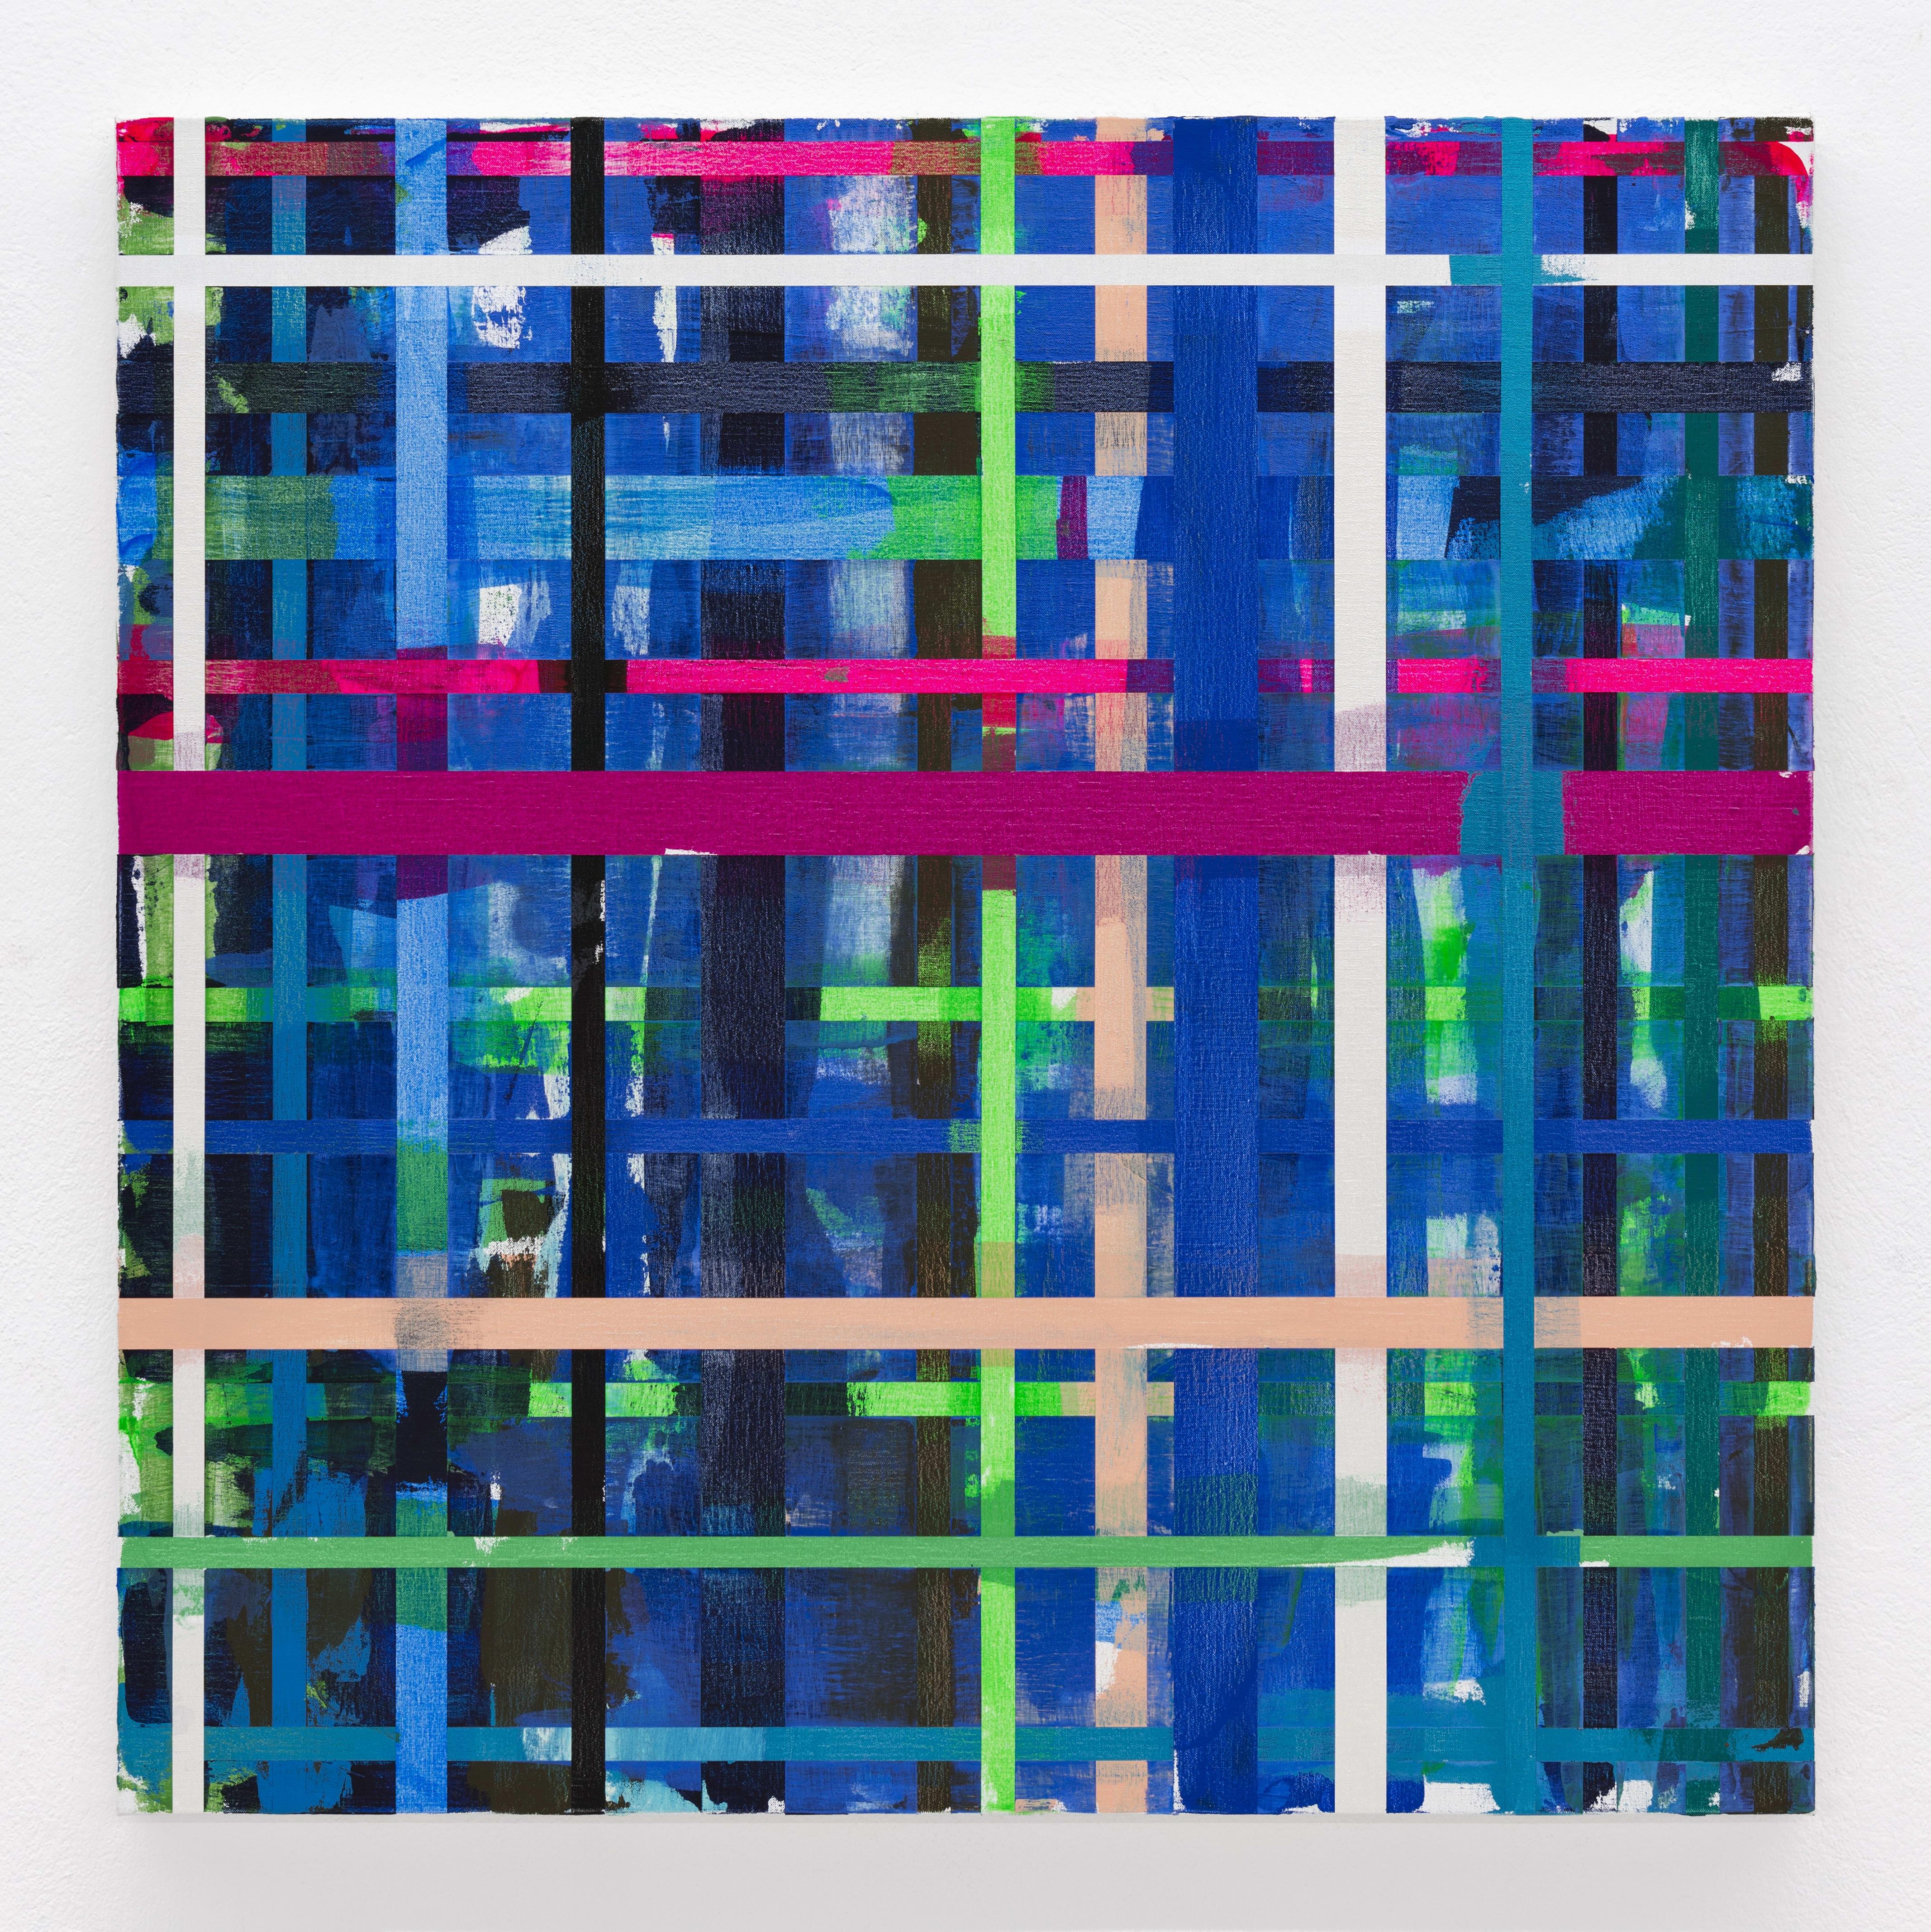 Untitled (HZ 2016-092) by Heimo Zobernig